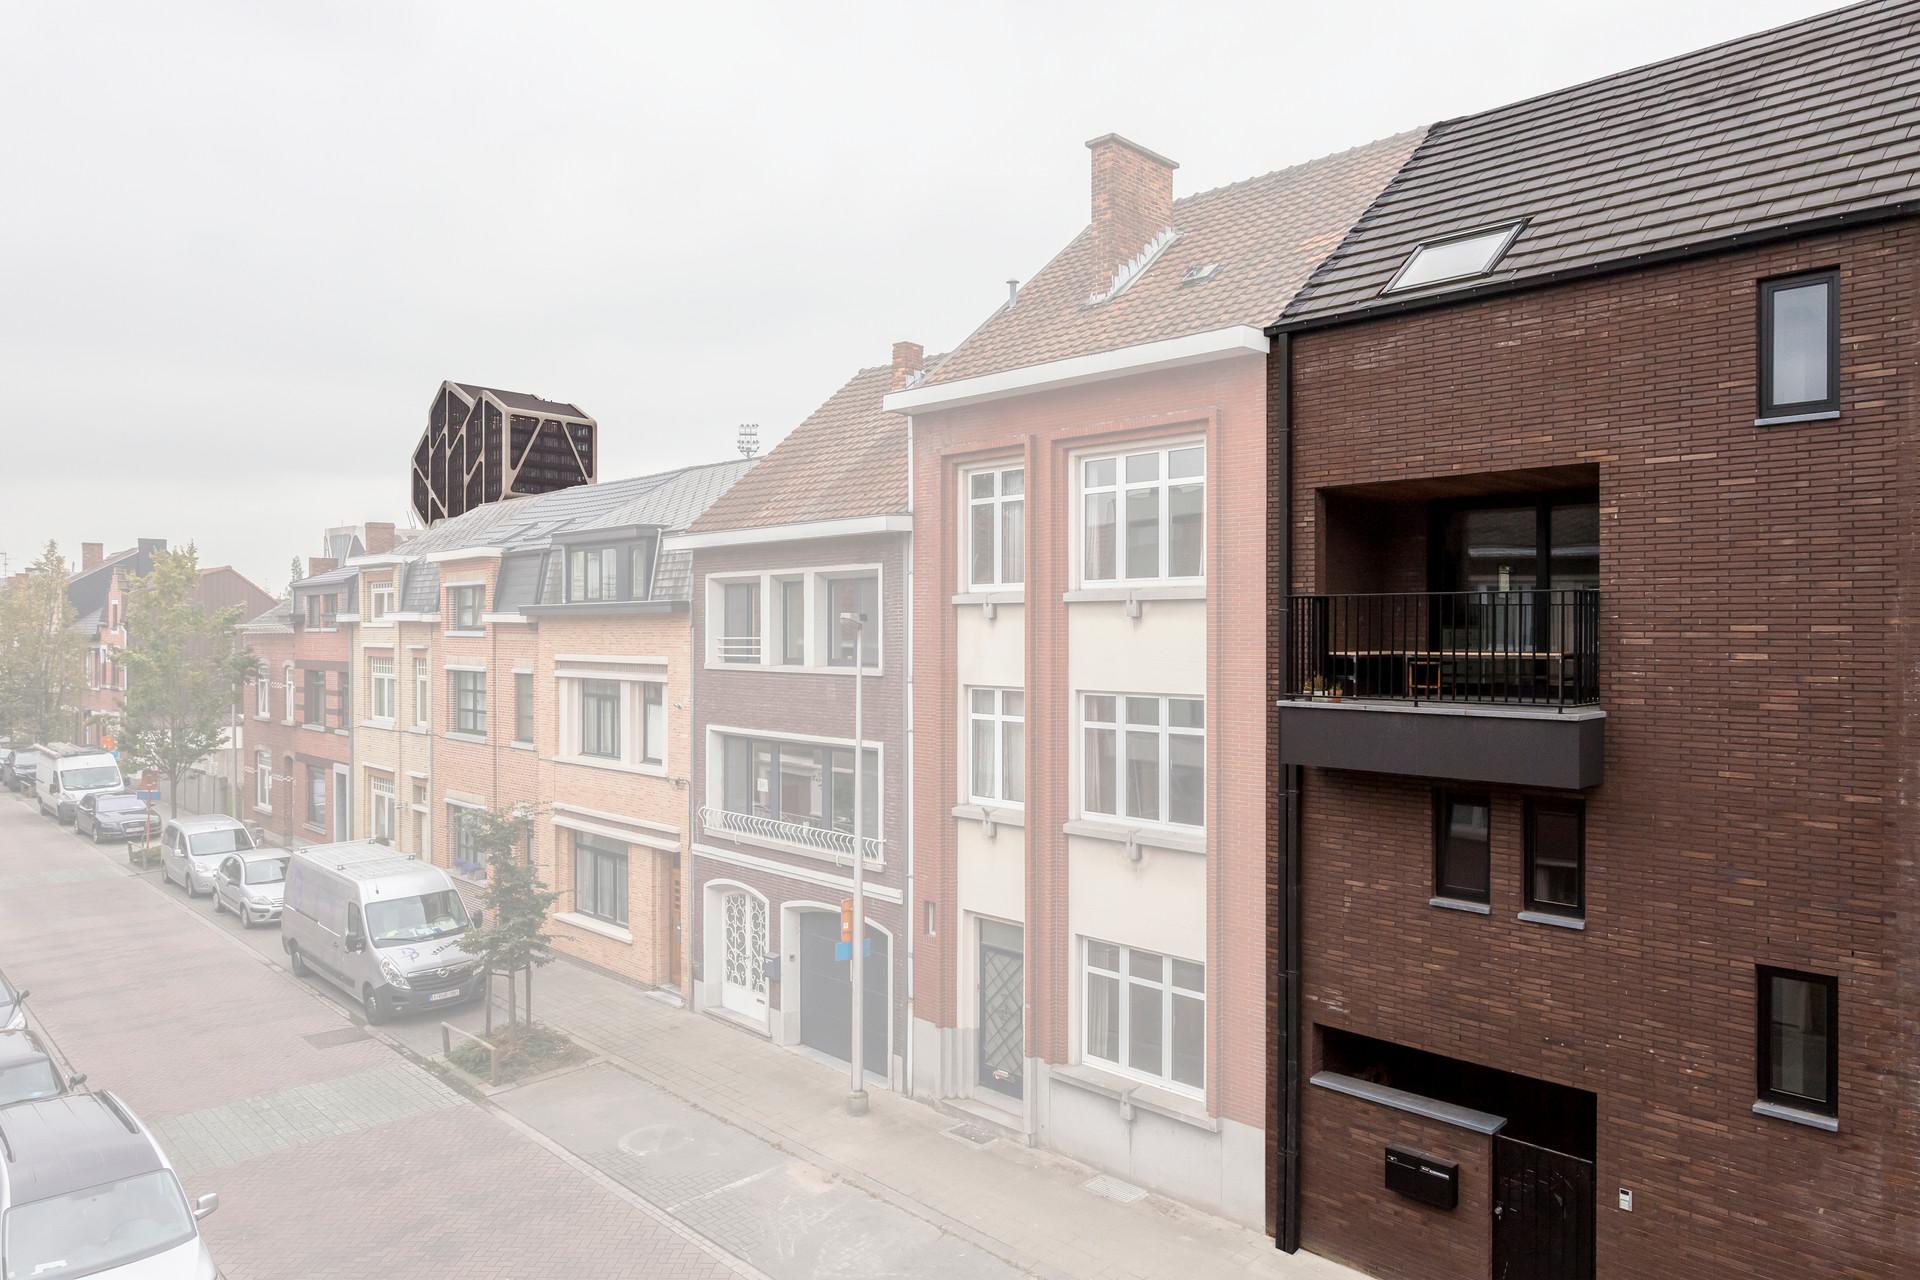 Tussenwoning Hasselt High Res-14_AANGEPA